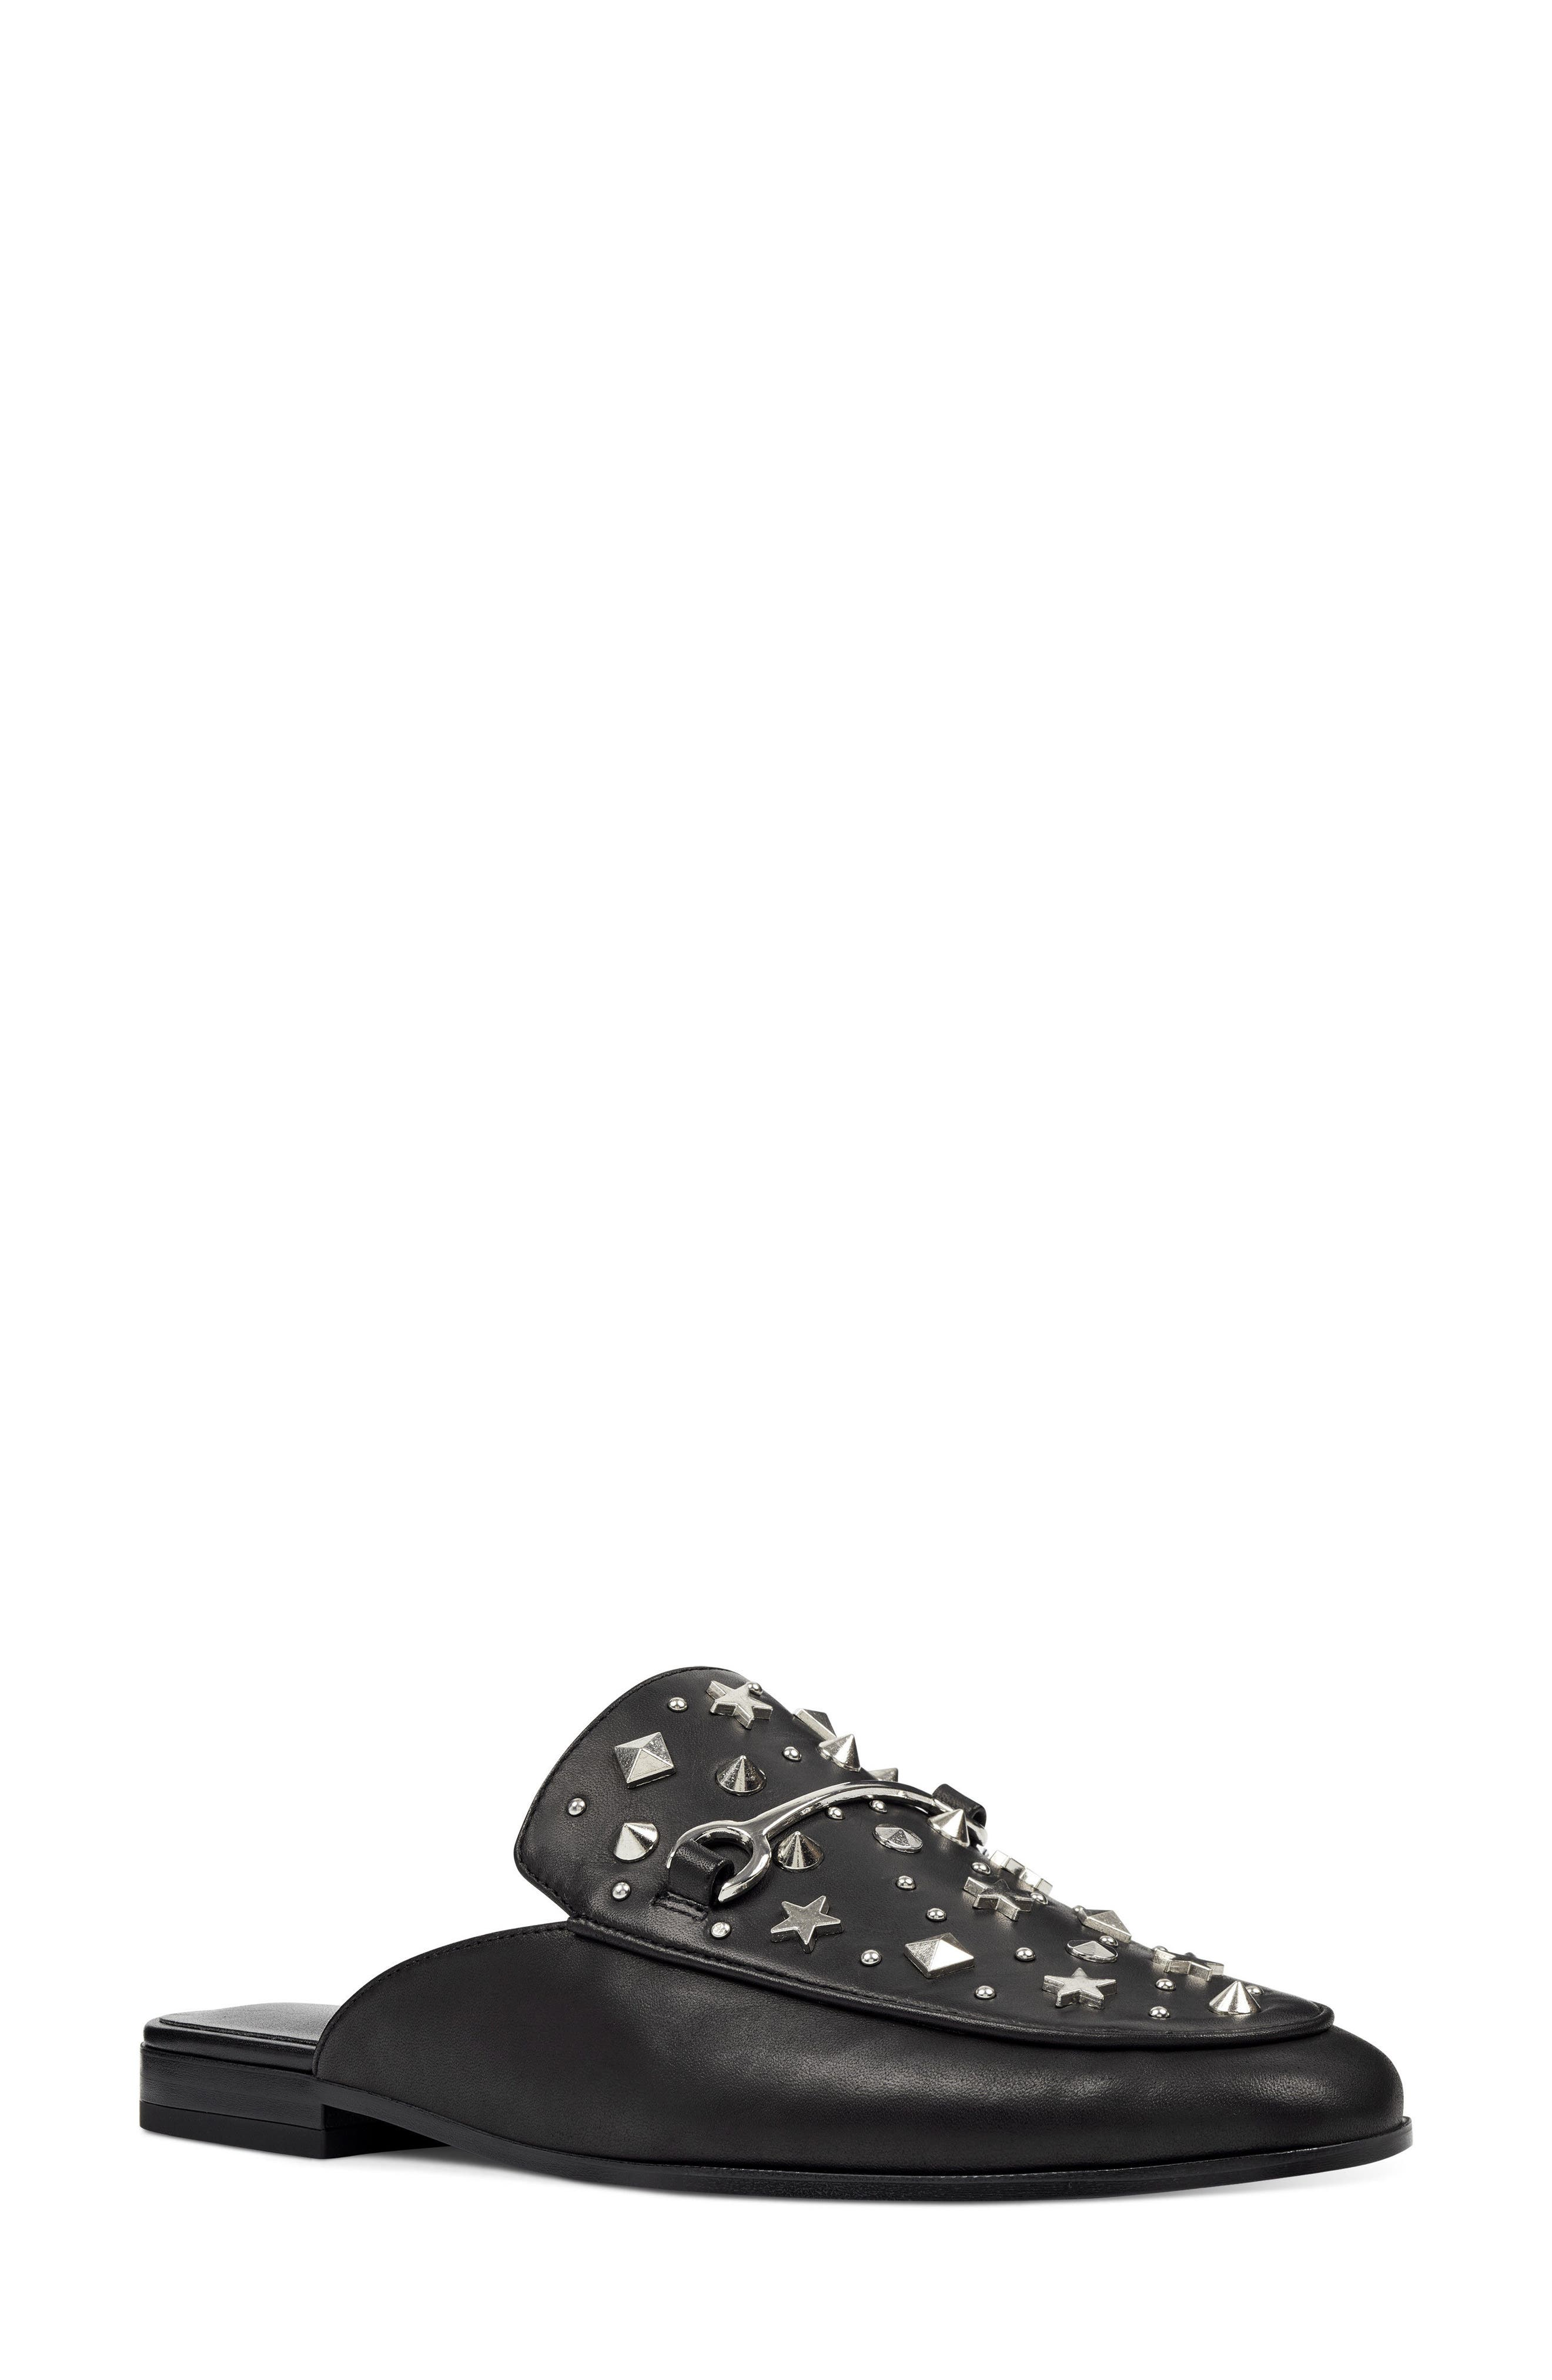 Welynne Mule,                         Main,                         color, Black Leather